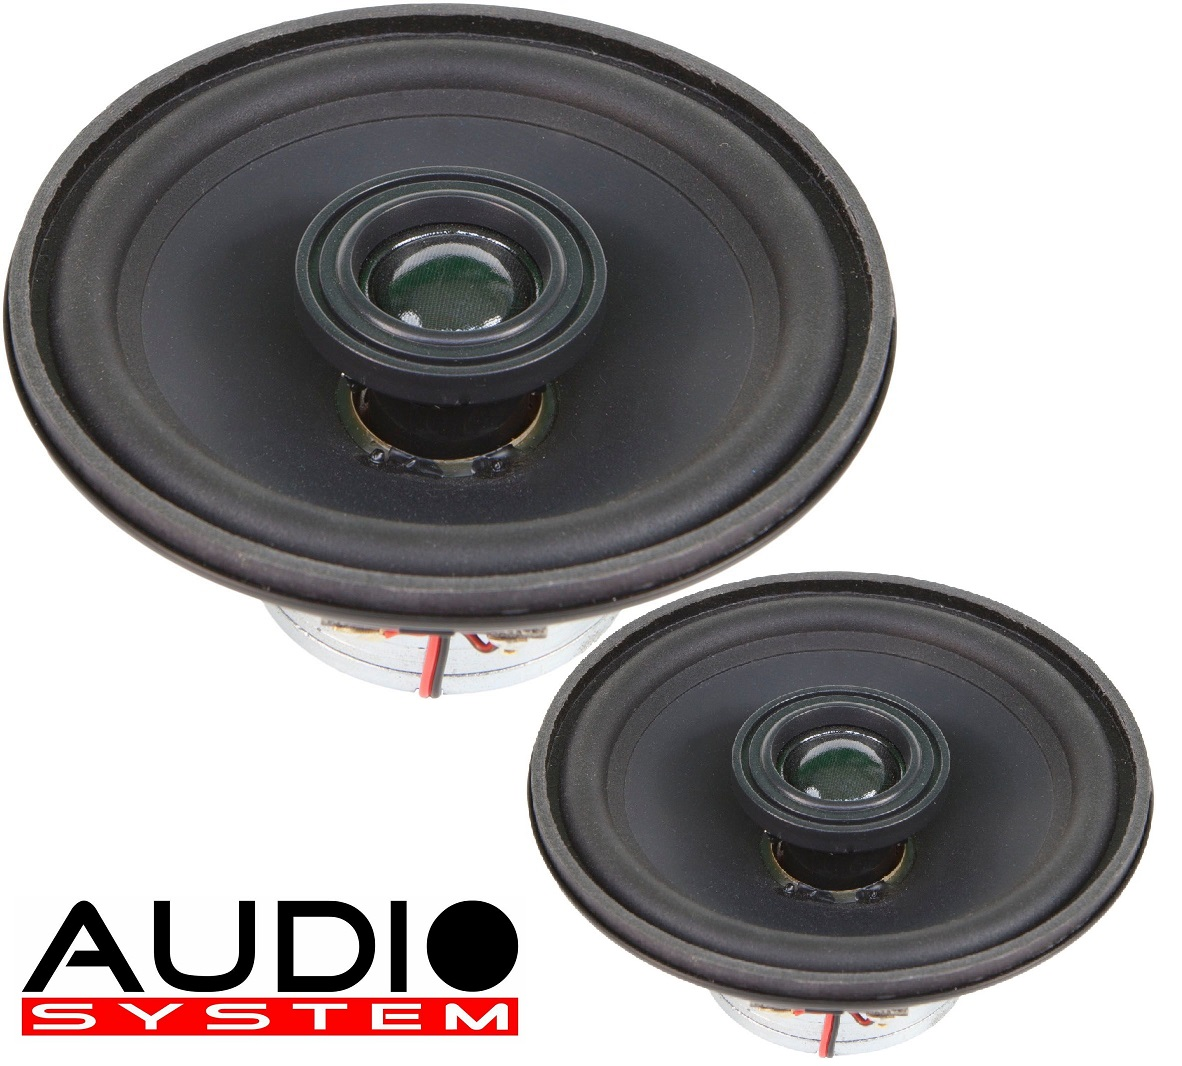 Audio System XC 120 EVO X-SERIES Neodym Coaxial System 12cm, 125 Watt 1 Paar - passend für viele Mercedes Benz E Klasse W124